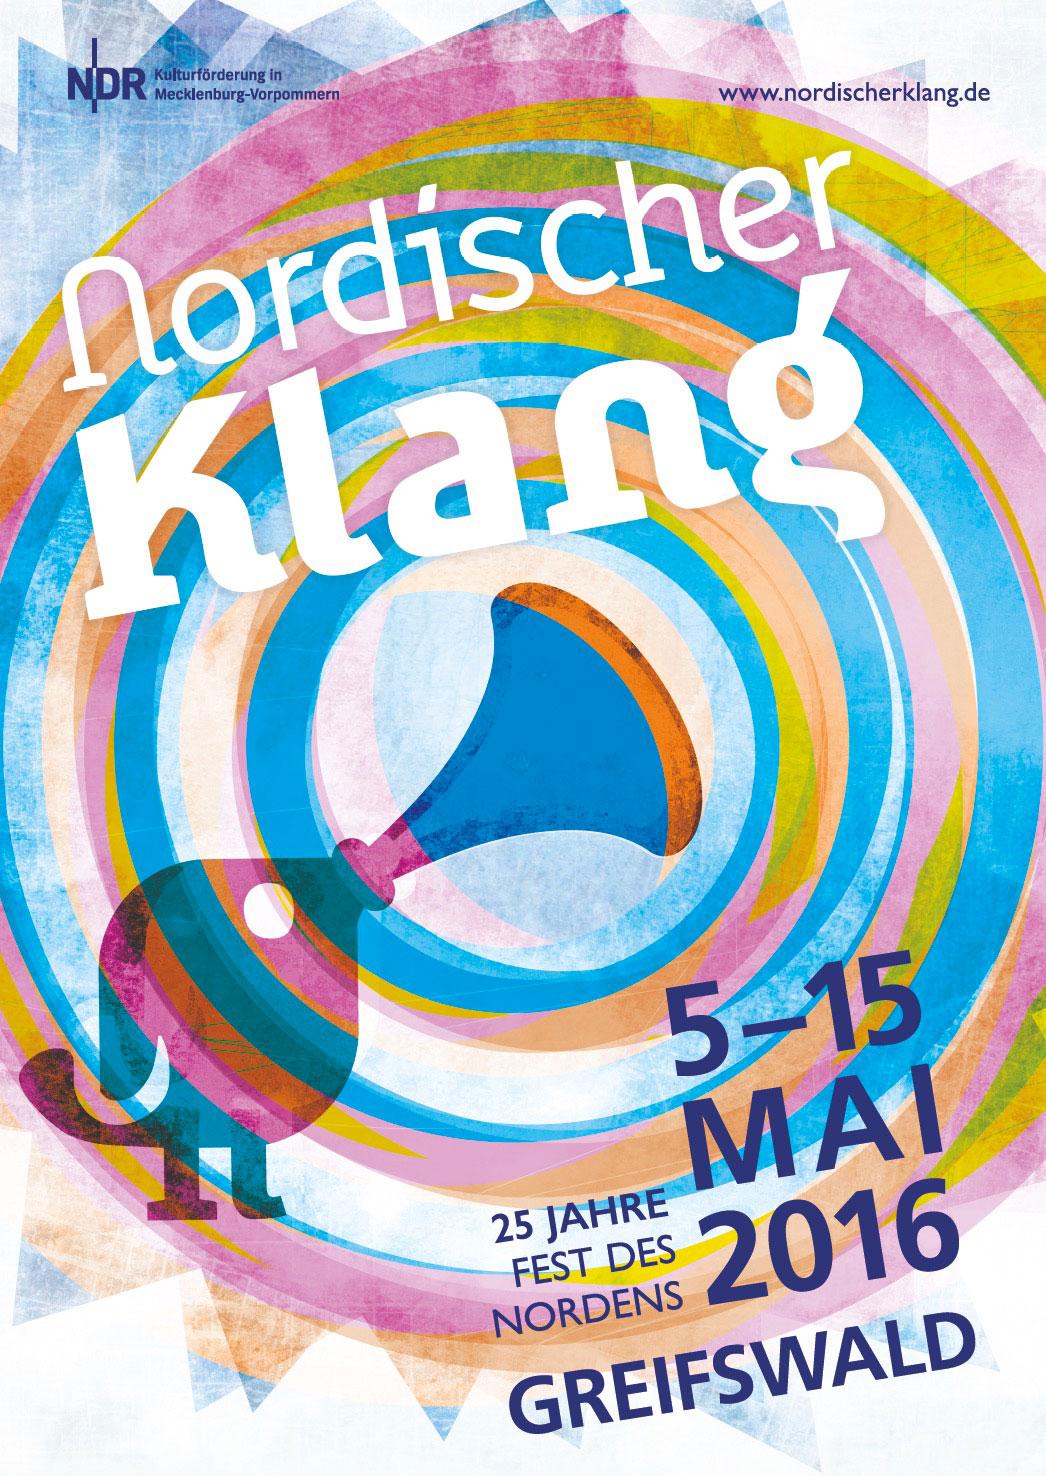 Autor: Nordischer Klang e.V.